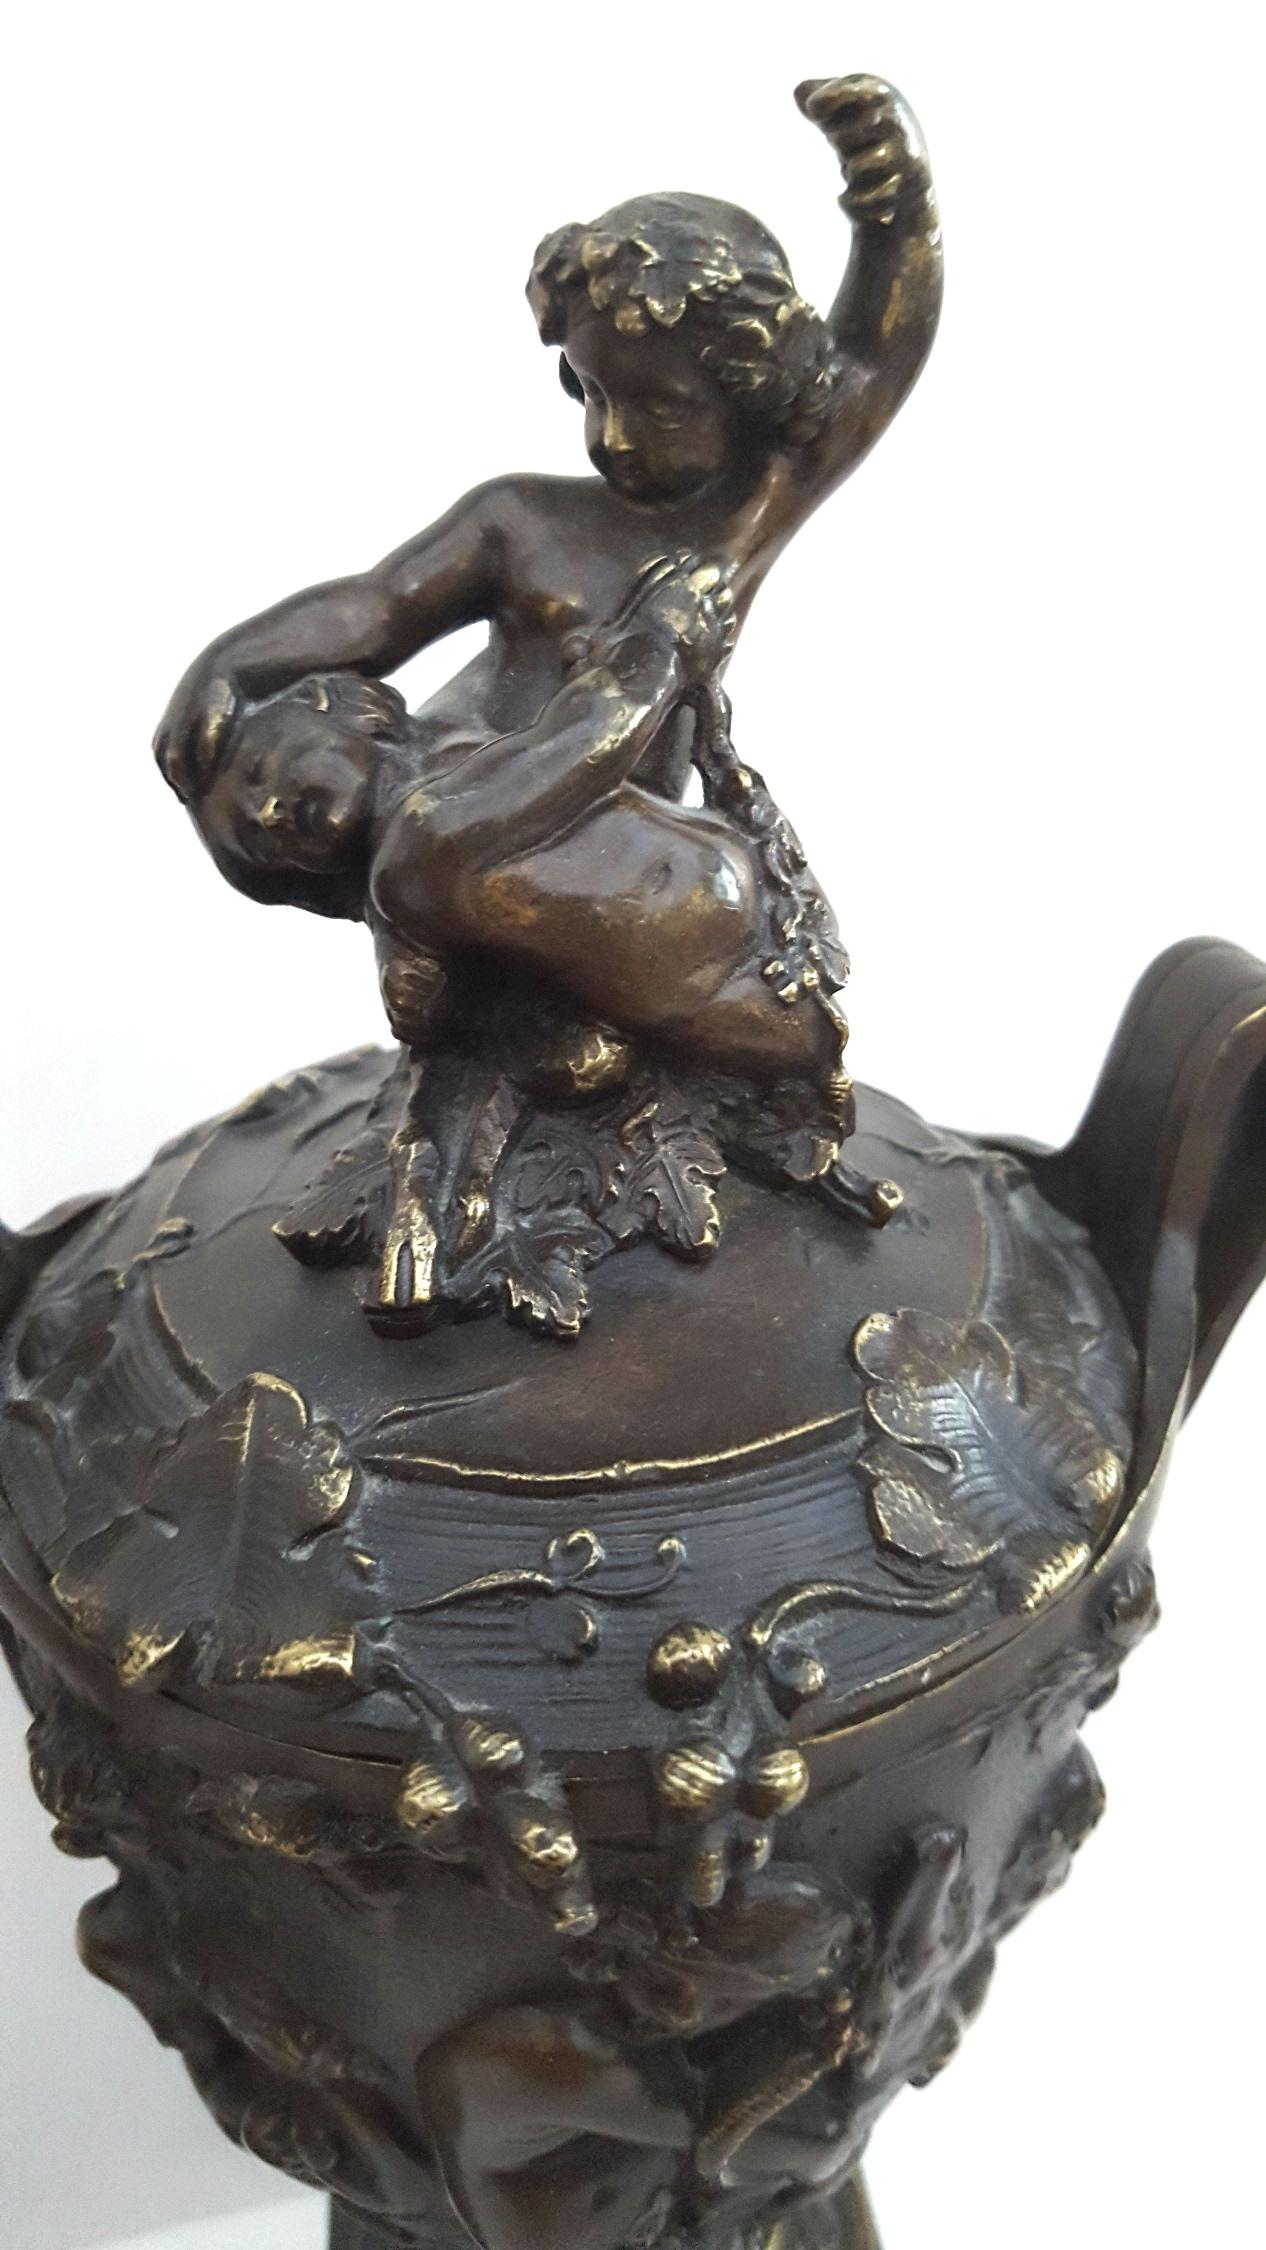 Antique 2 Bronze Lidded Vases On Slate Plinths Depicting Fauns Ram Lion Bacchus & Grape Vines - Image 3 of 5